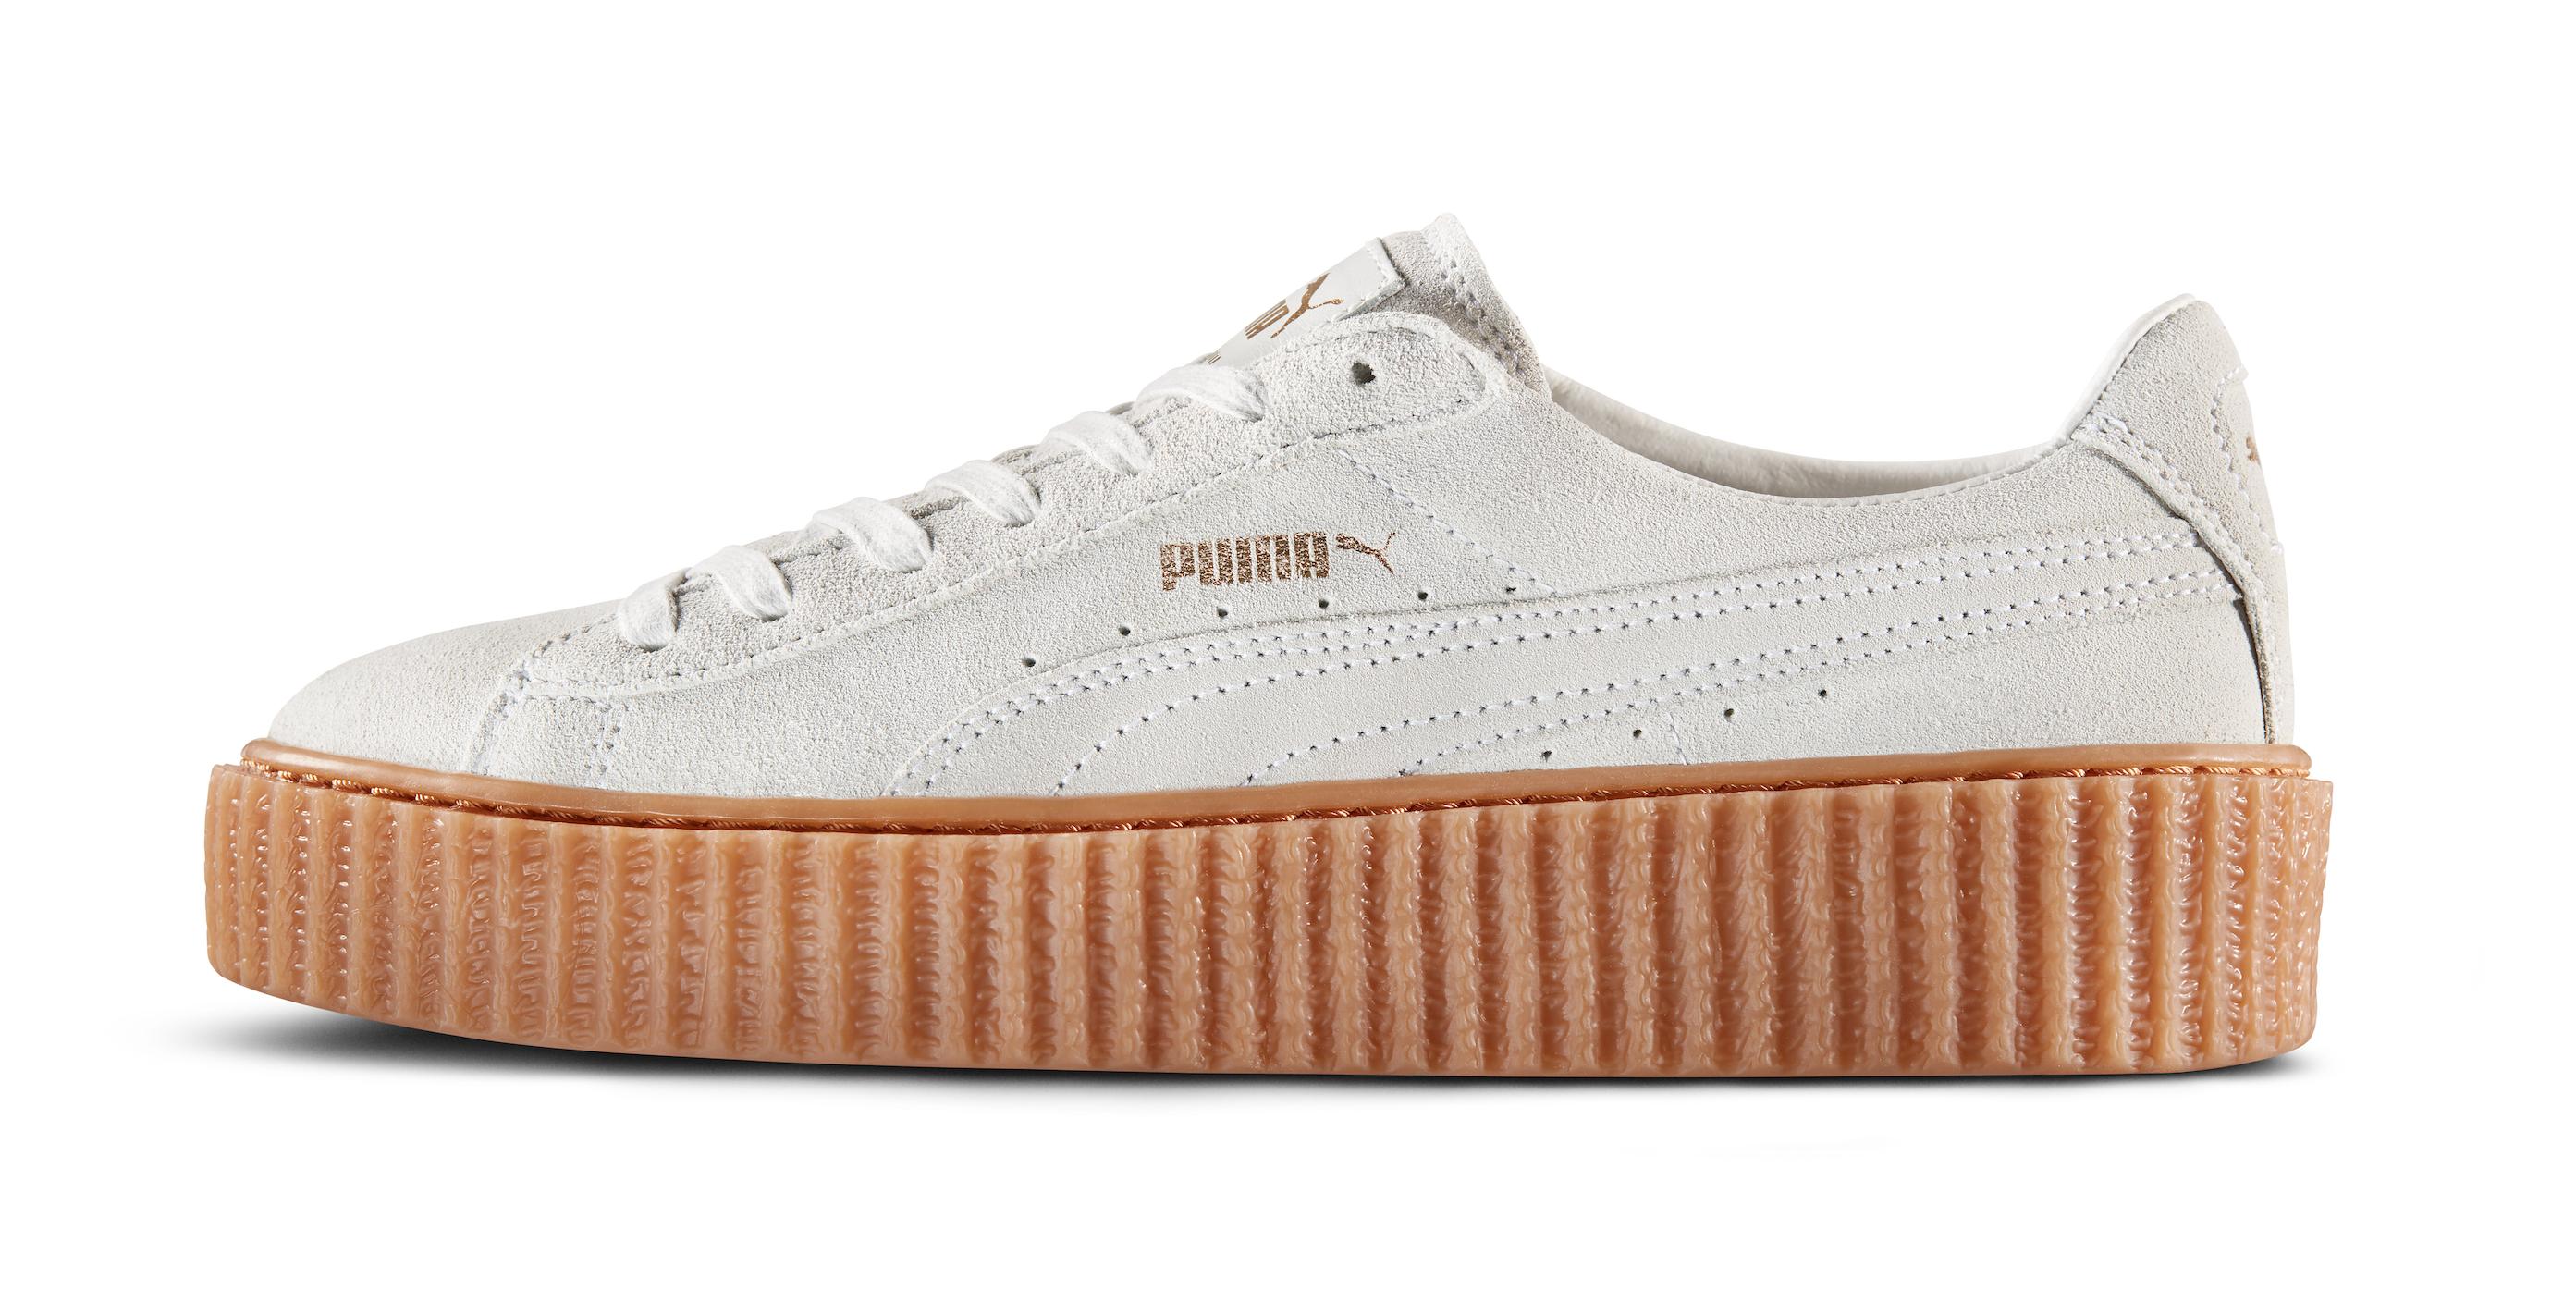 Puma Creepers White Gum